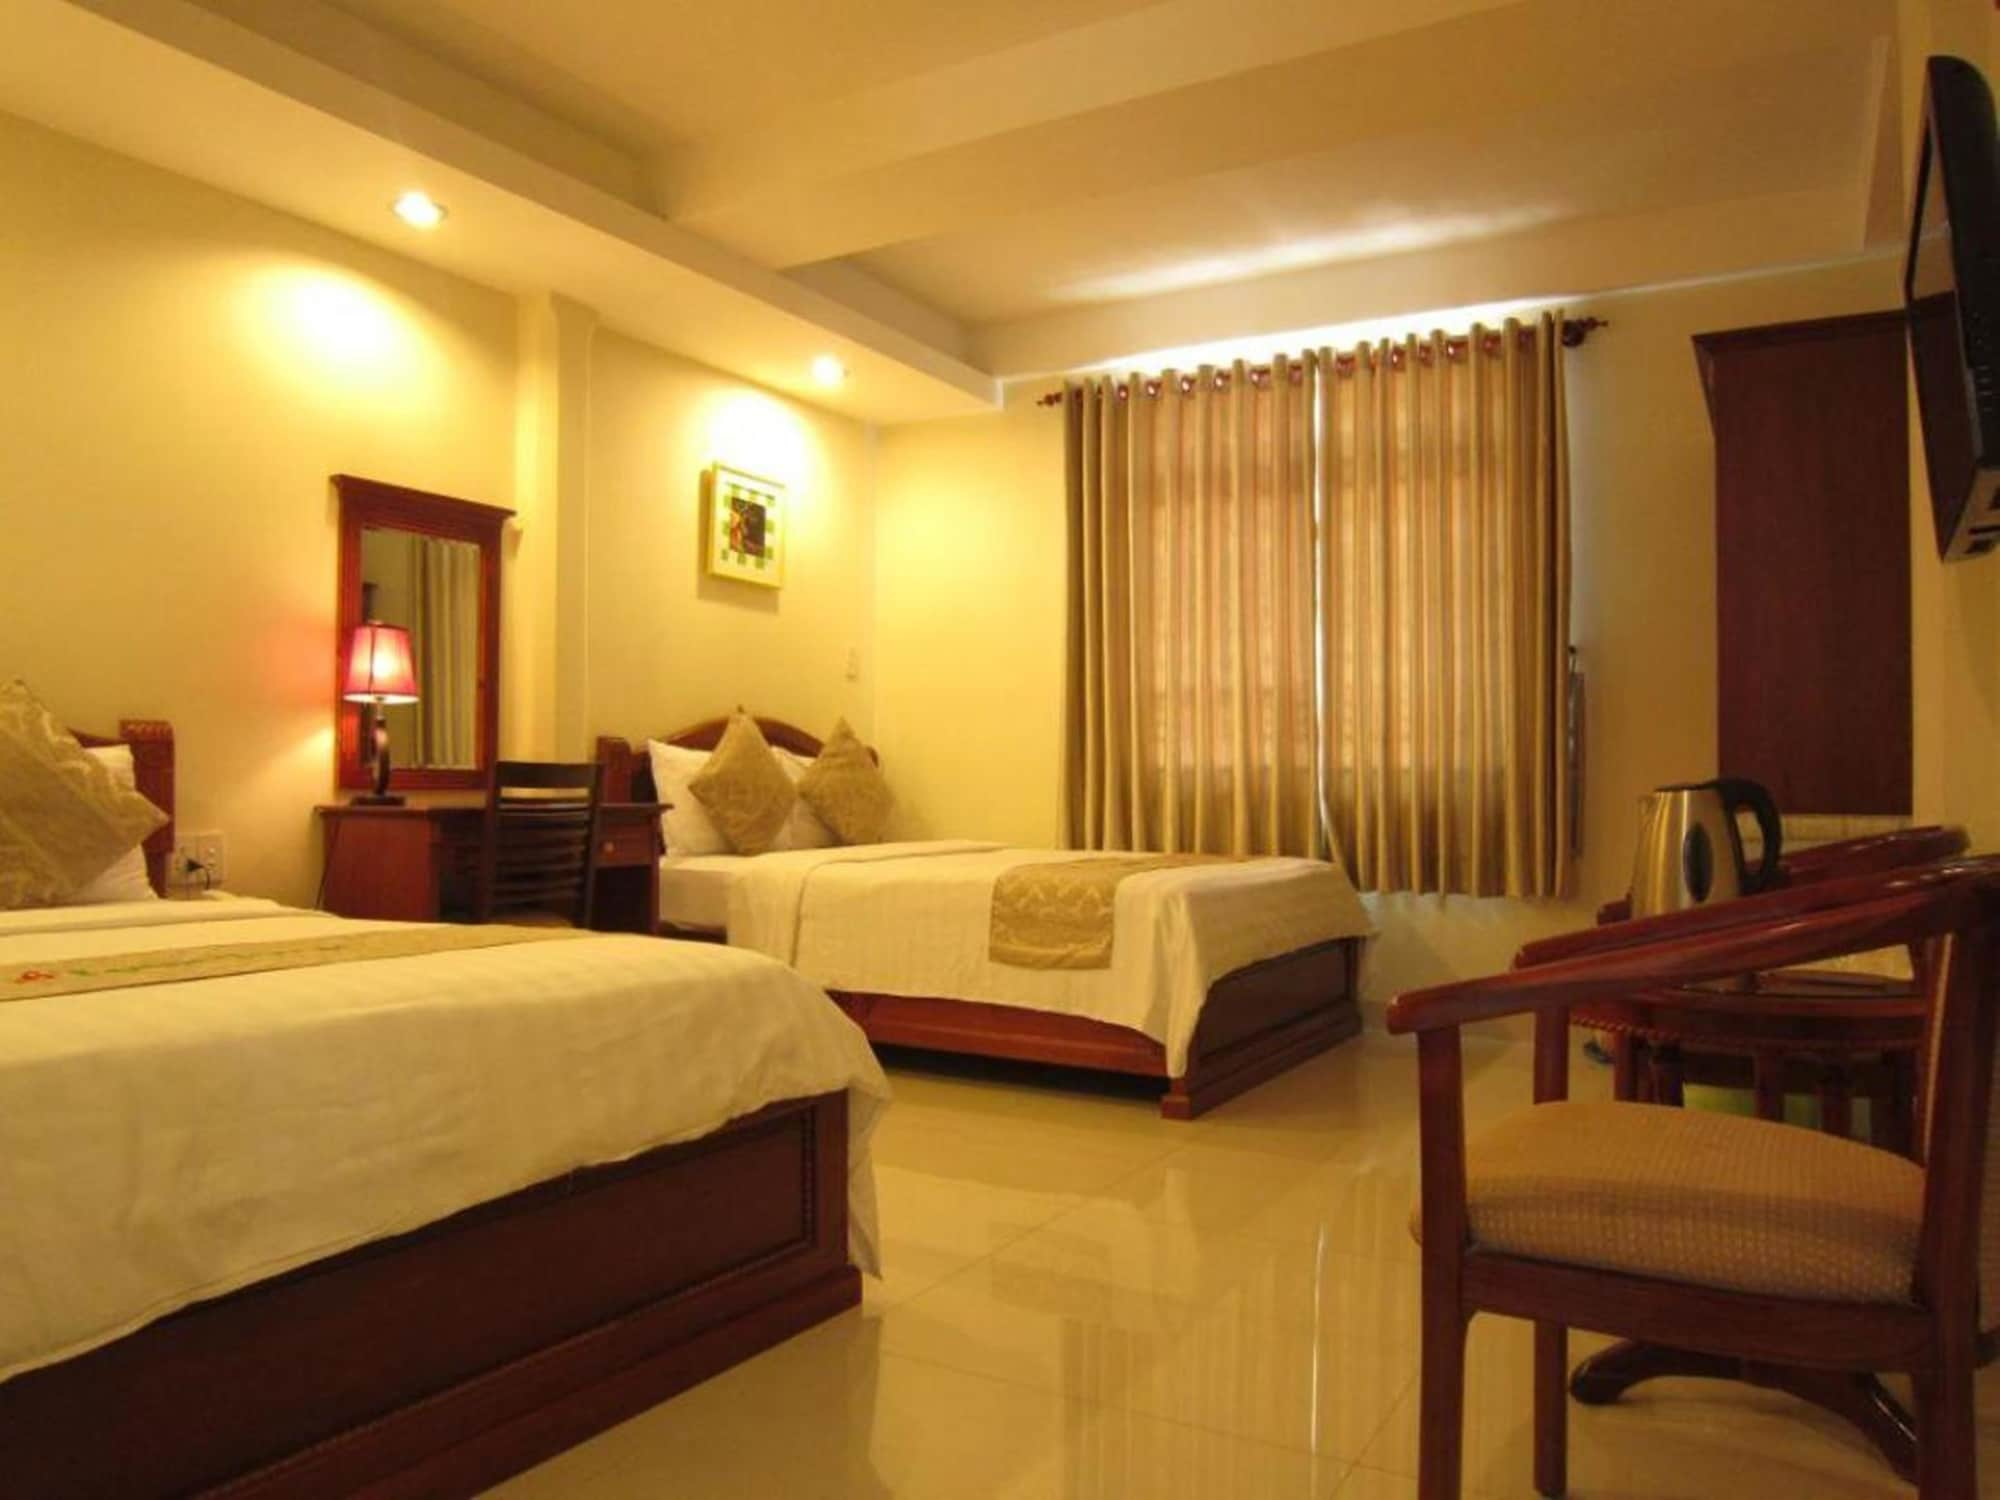 Hoang Hoang Hotel, Quận 1